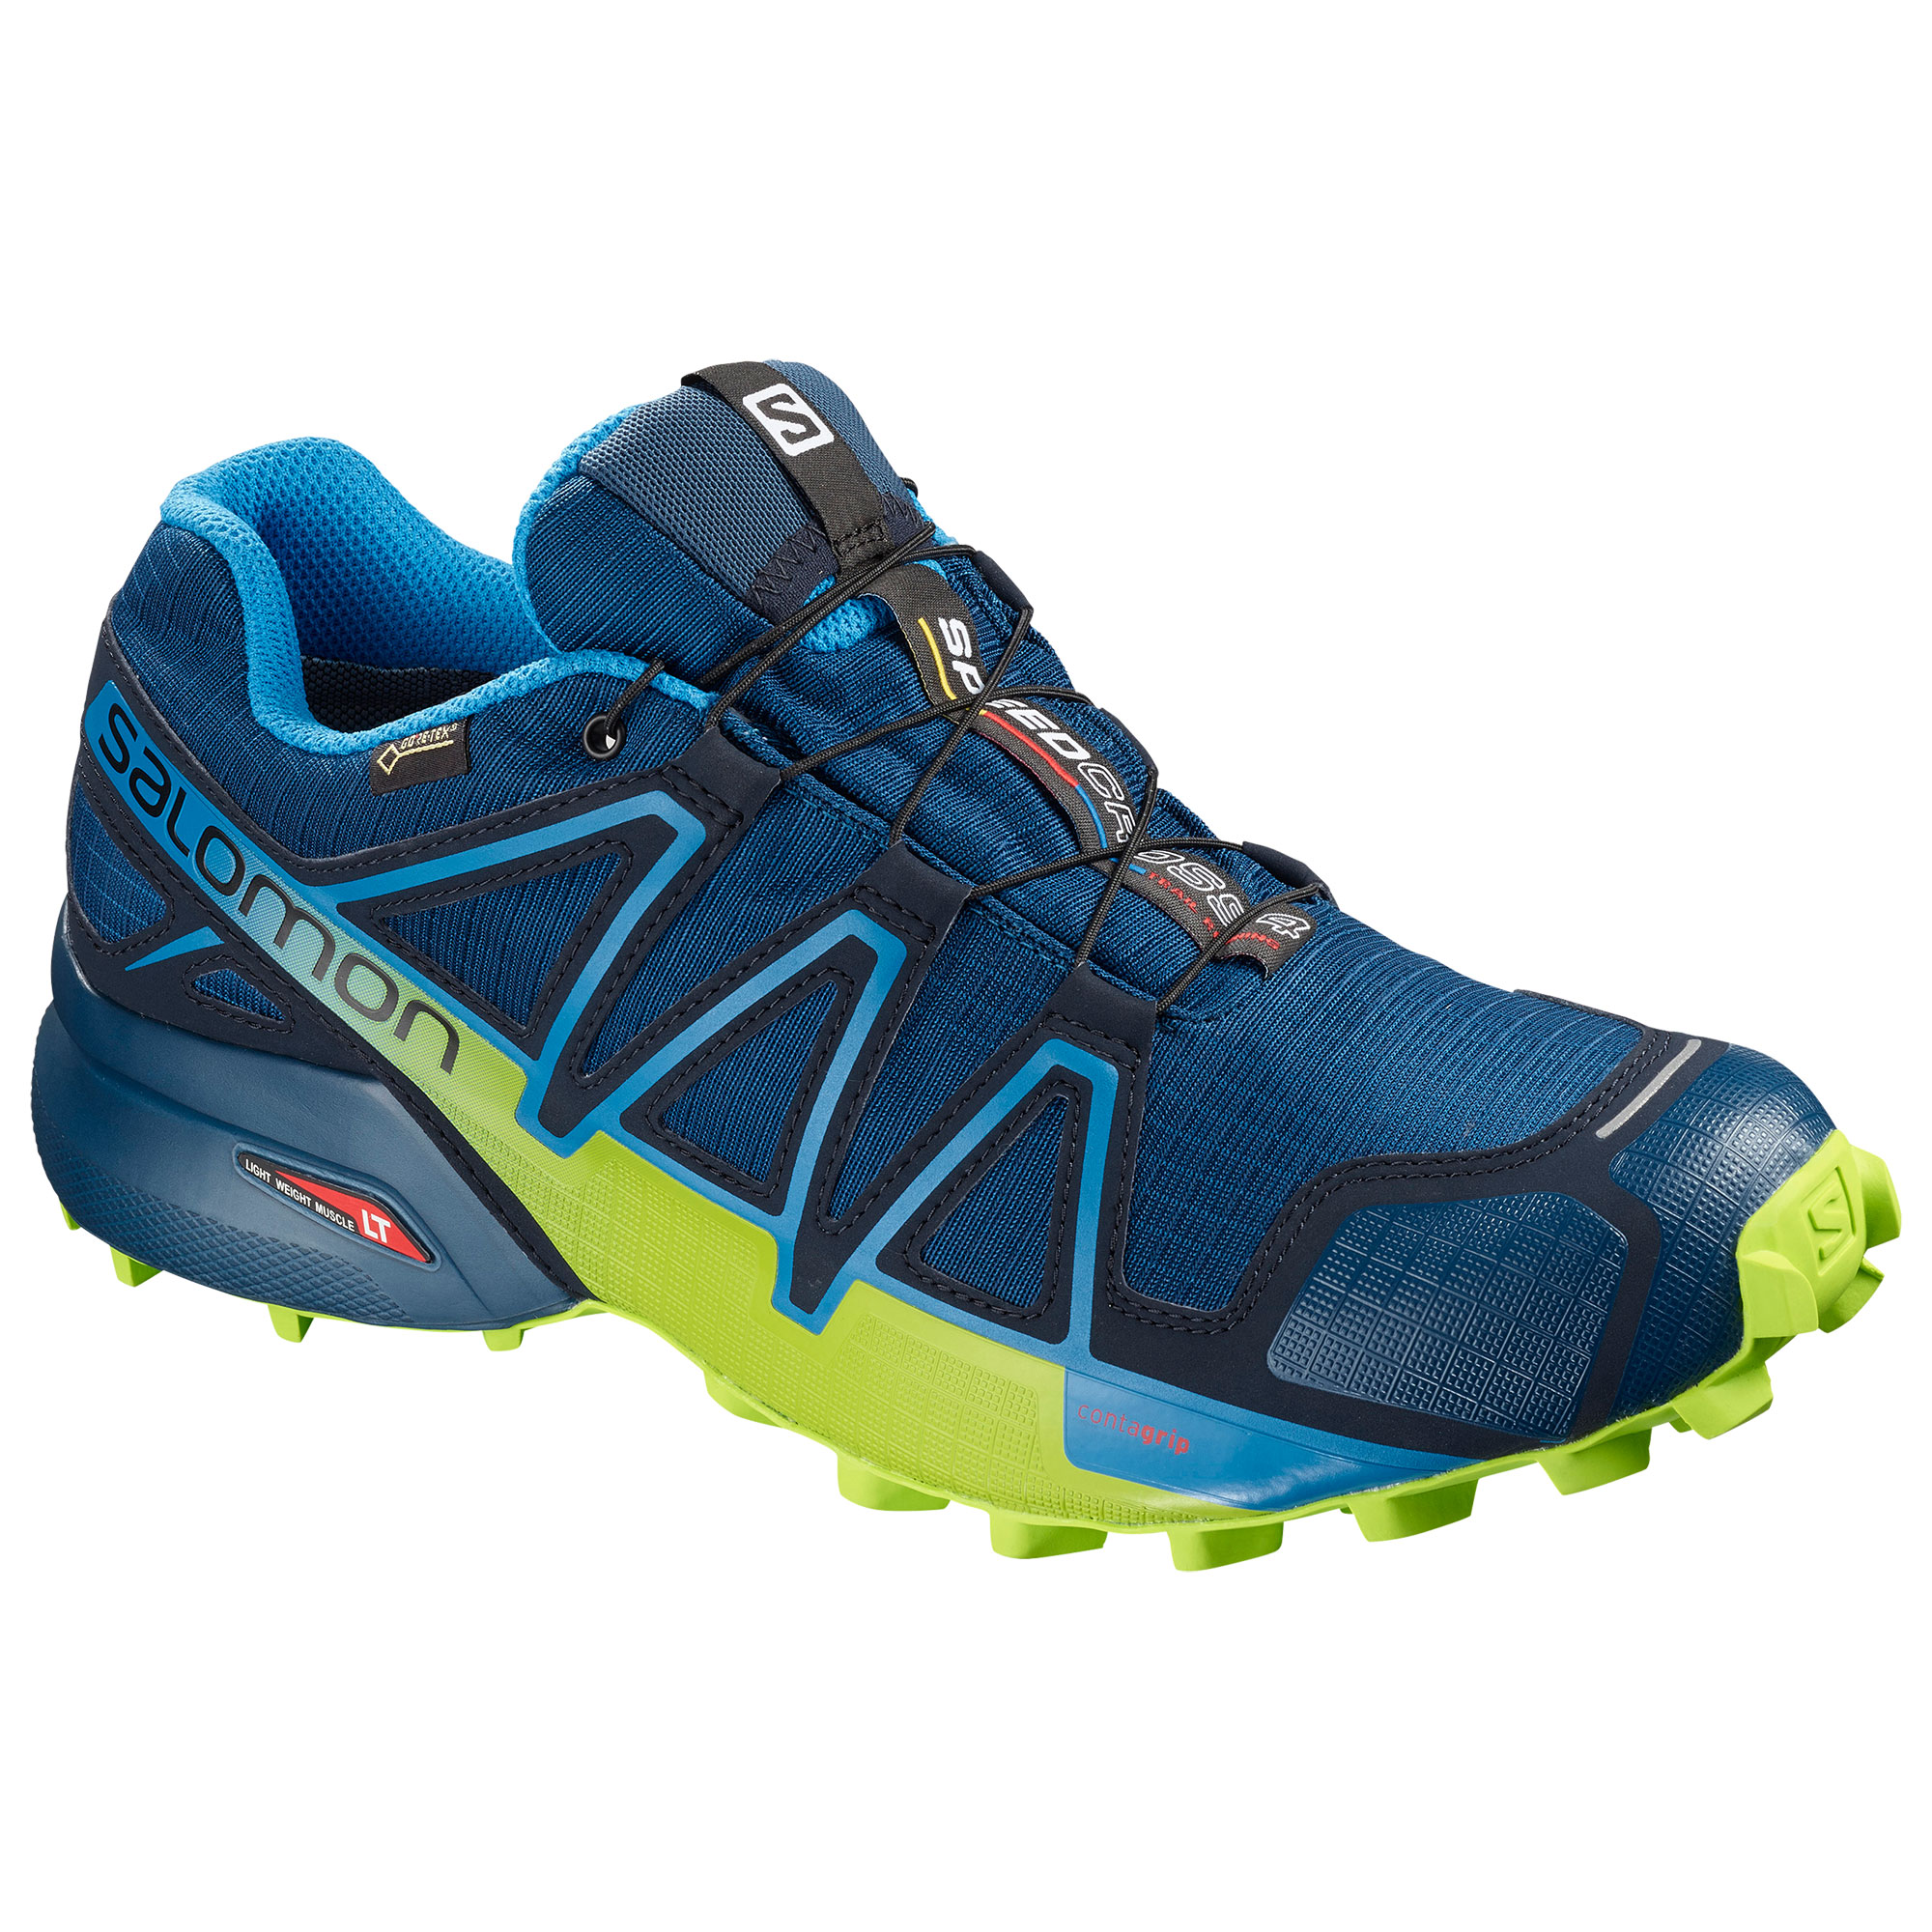 Details about Salomon Speedcross 4 GTX Womens Trail Running Shoes Blue